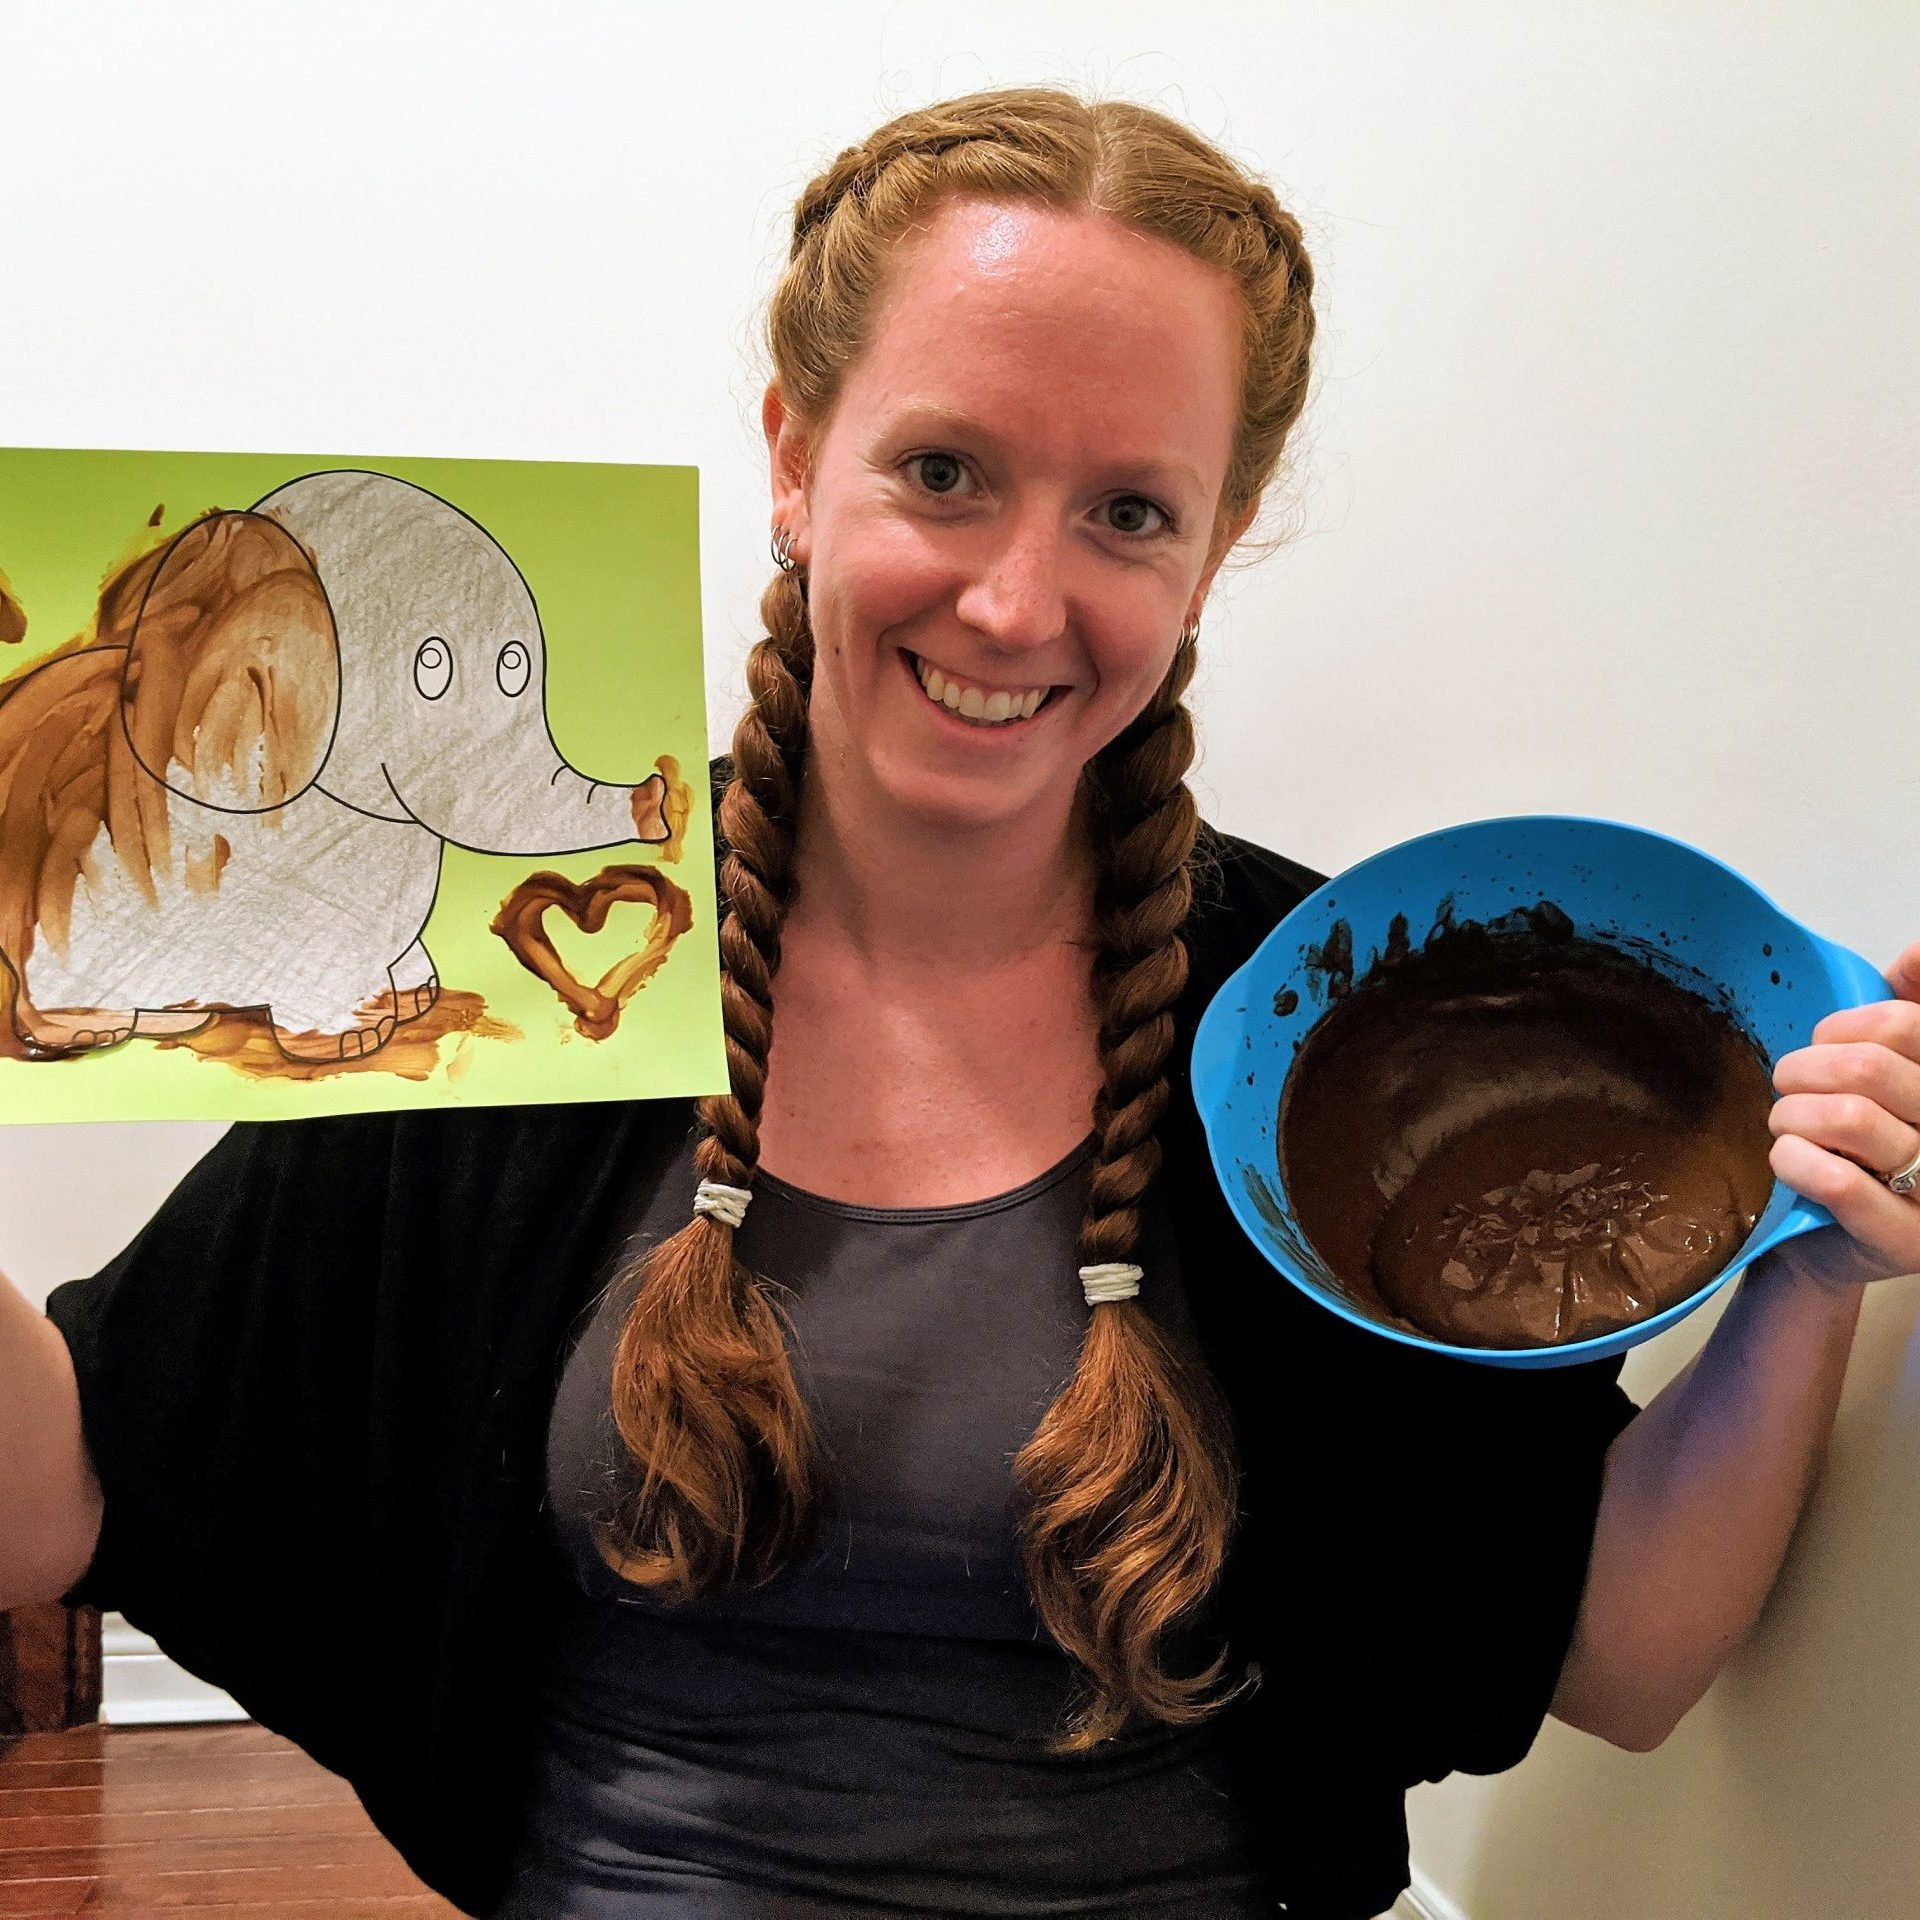 Chocolate Pudding Painting